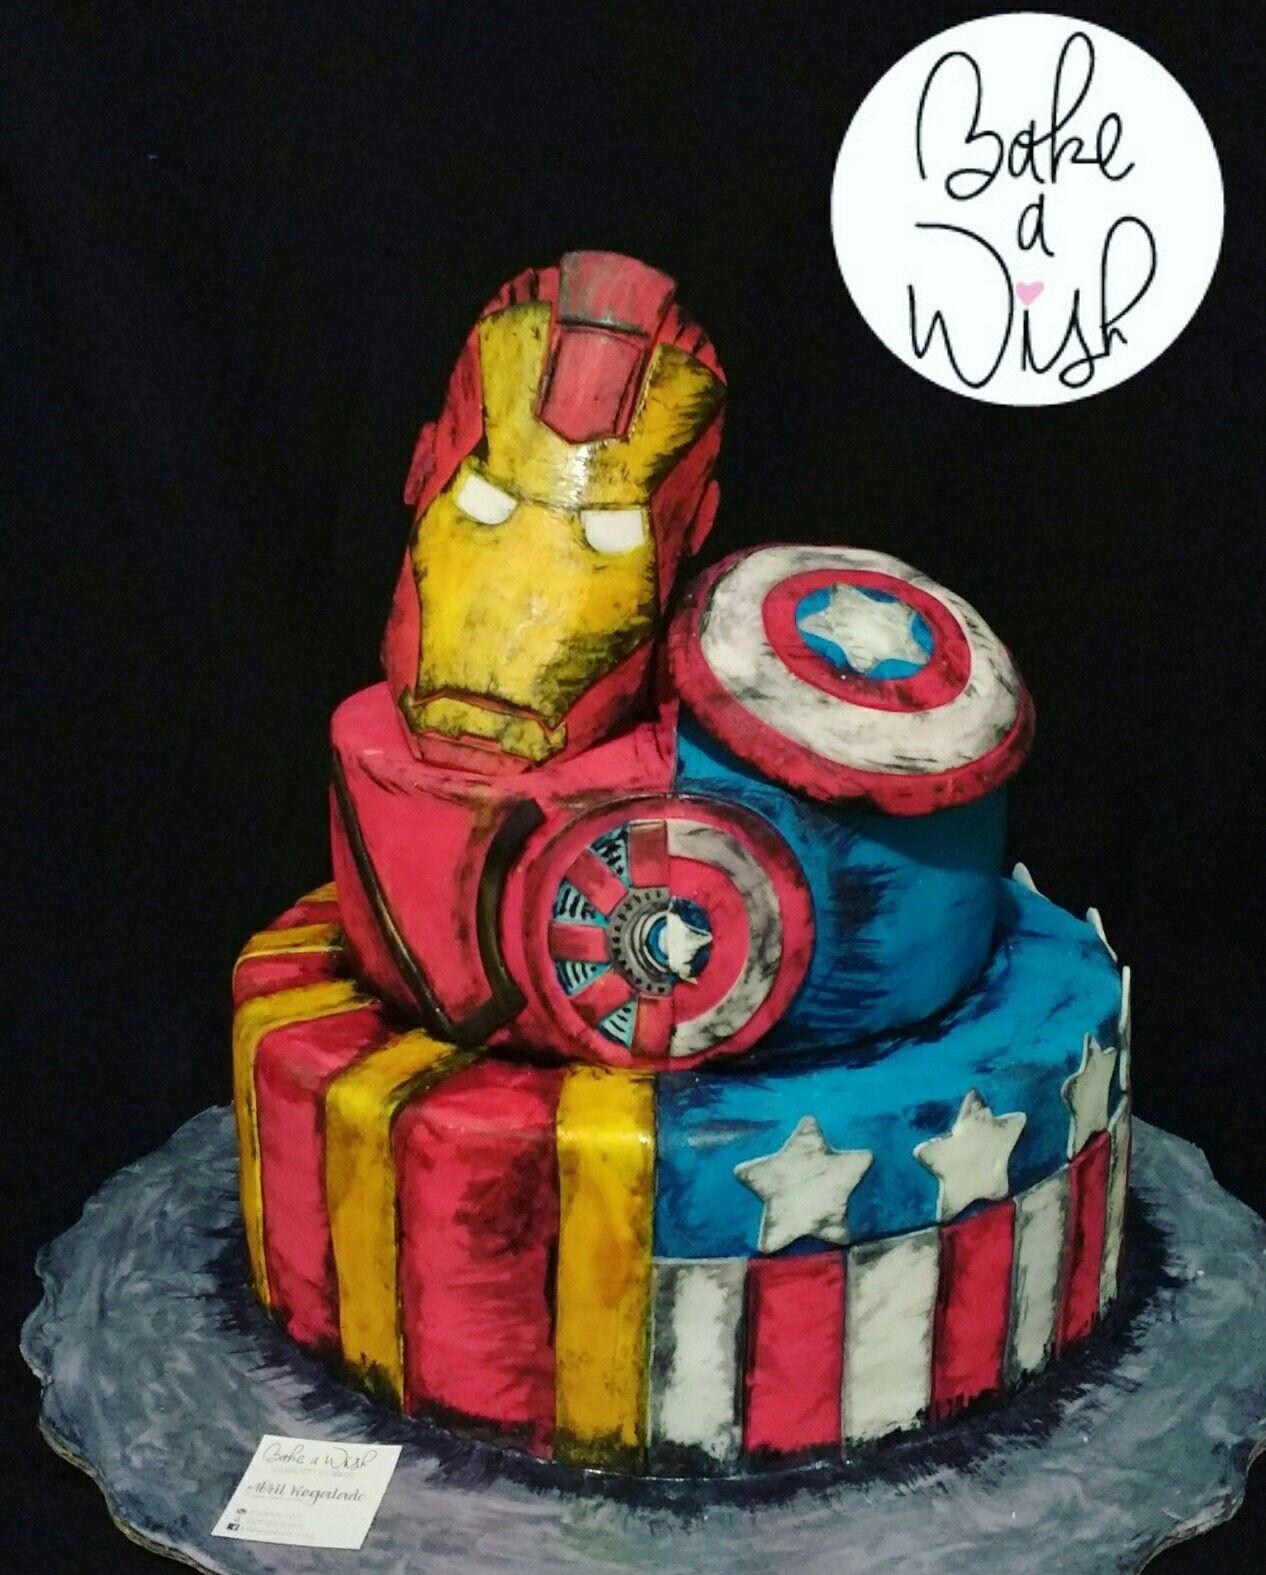 Civil War Cake Irnman Vs Cap America War Cake Cake Decorating Cake